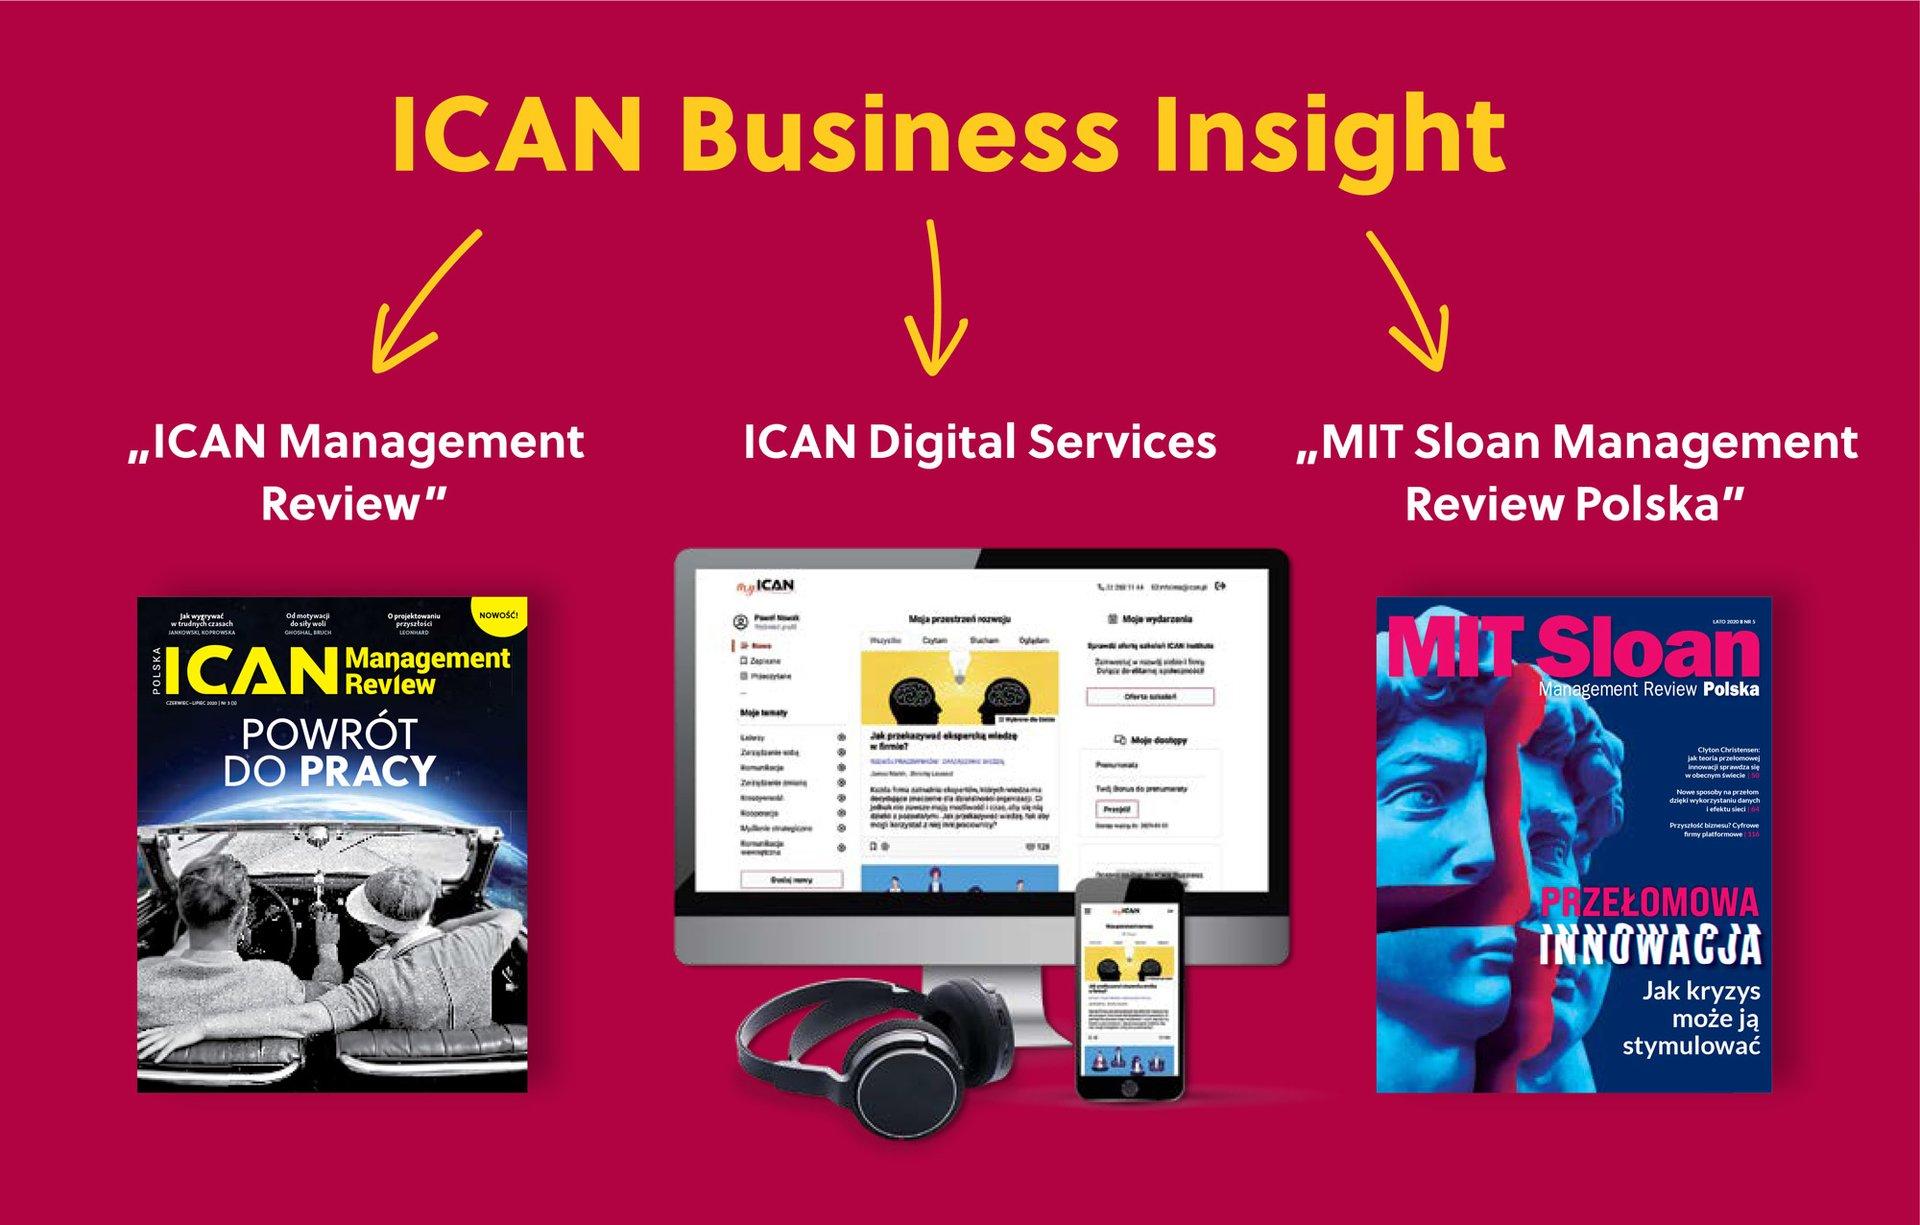 Uwaga! ICAN Institute  uruchamia nową platformę wiedzy ICAN Business Insight